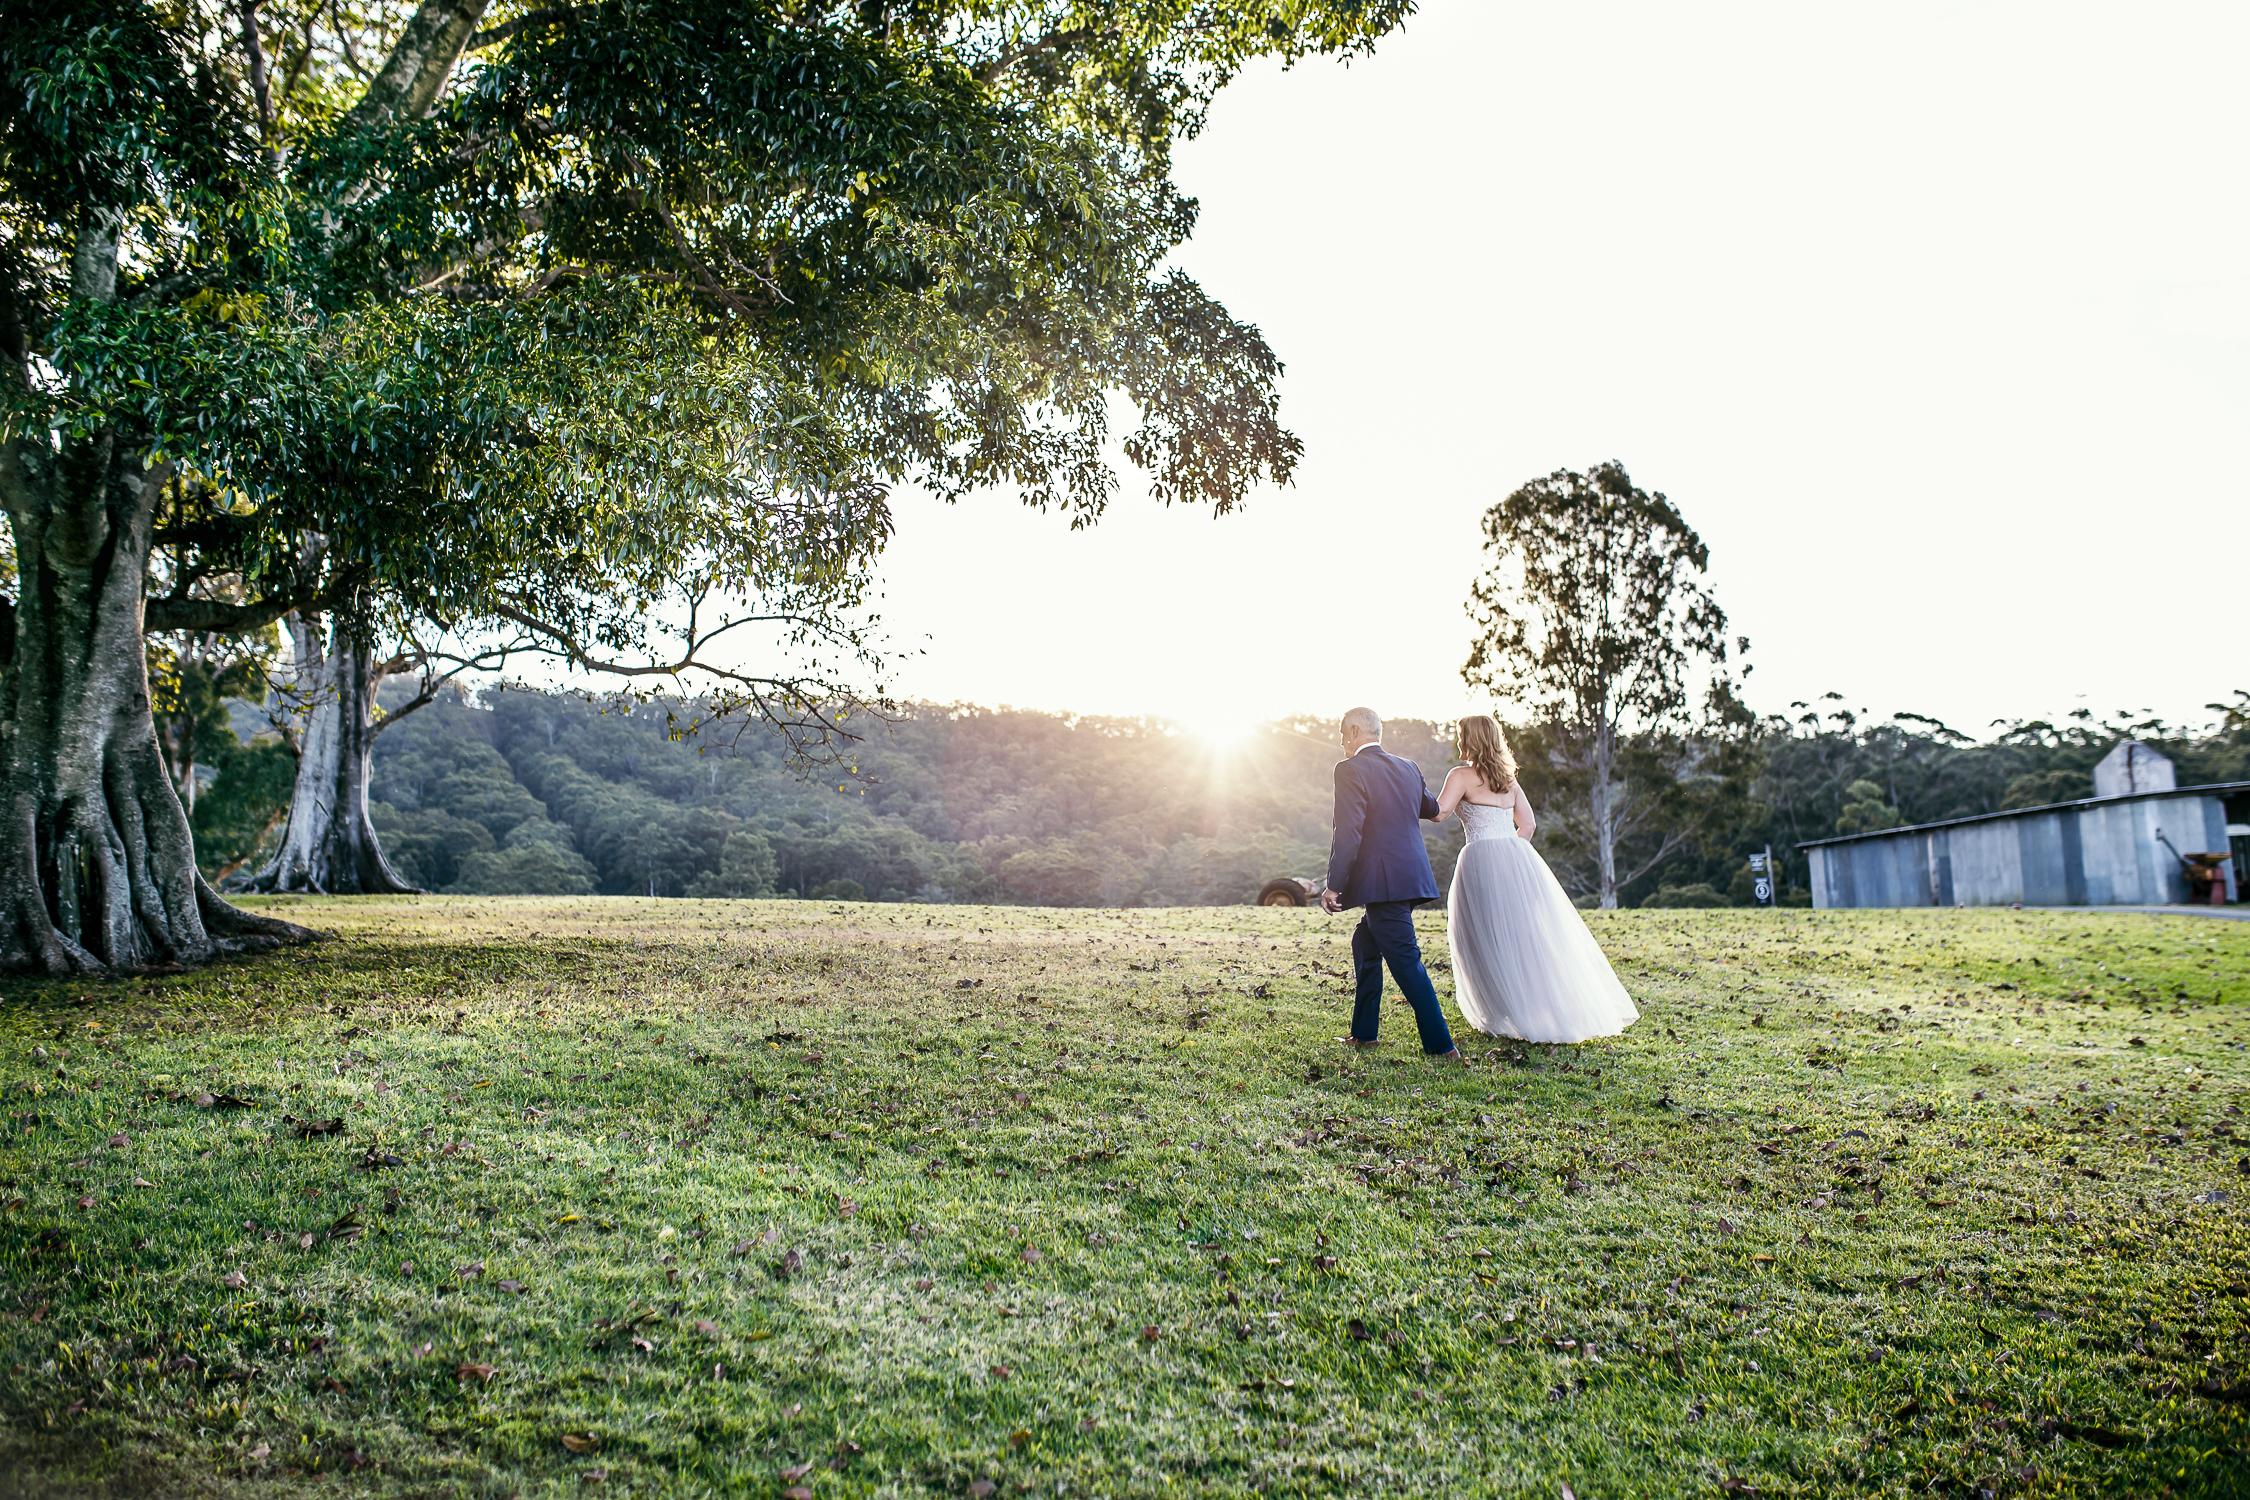 Gold_Coast_Hinterland_Barn_Wedding_Cowbell_Creek_True_North_Photography_Janine6-1.jpg